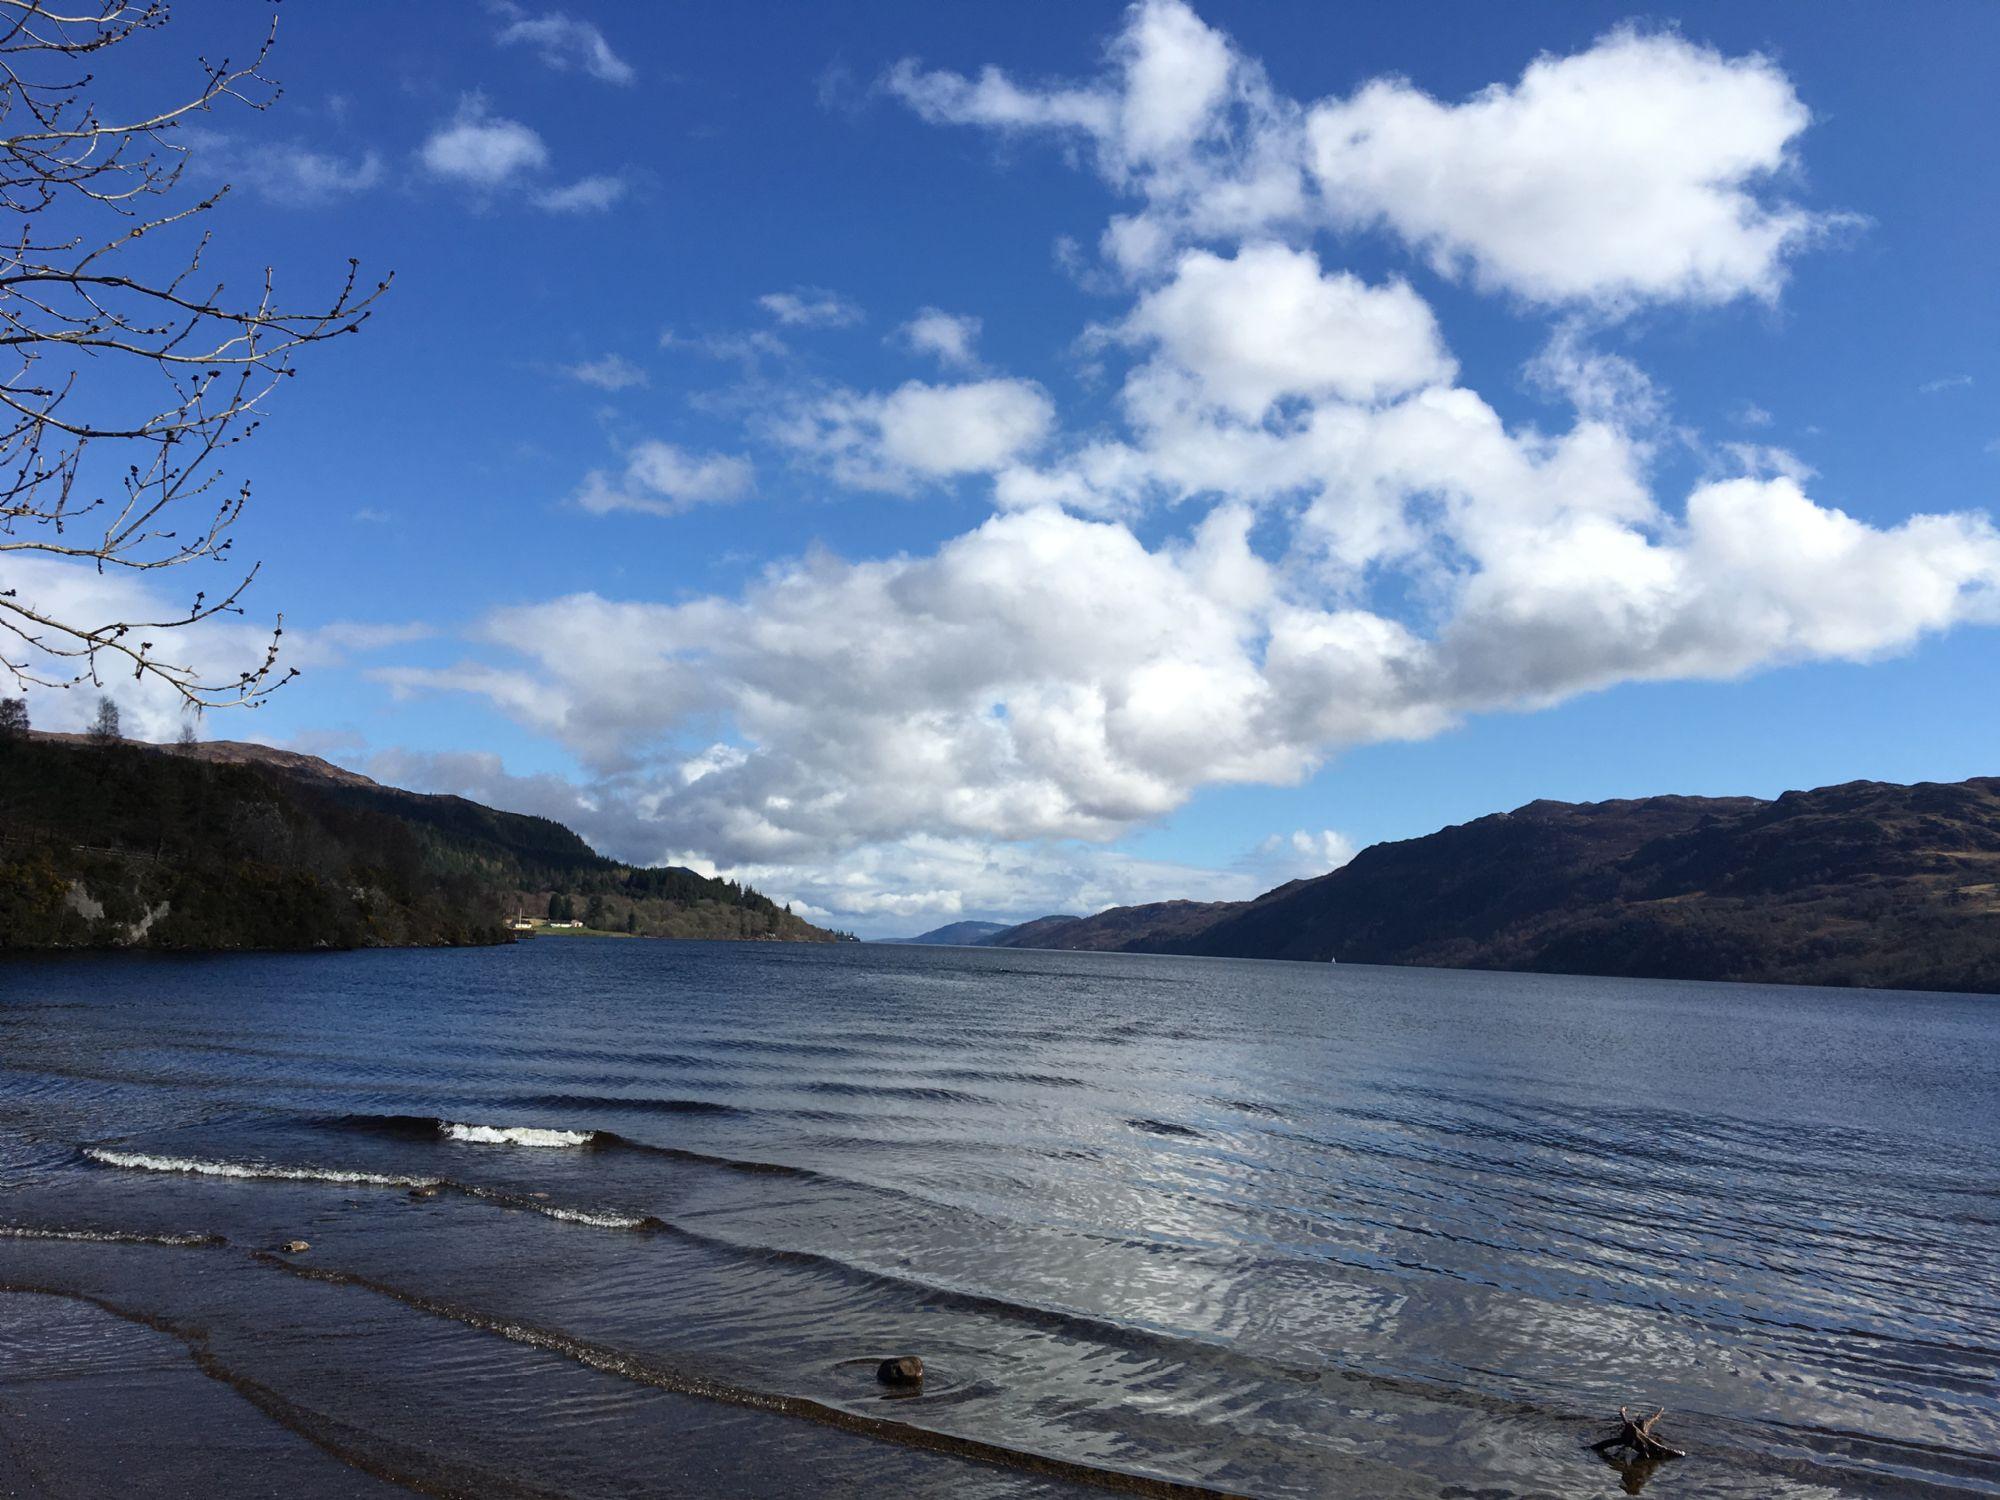 Loch Ness Rays